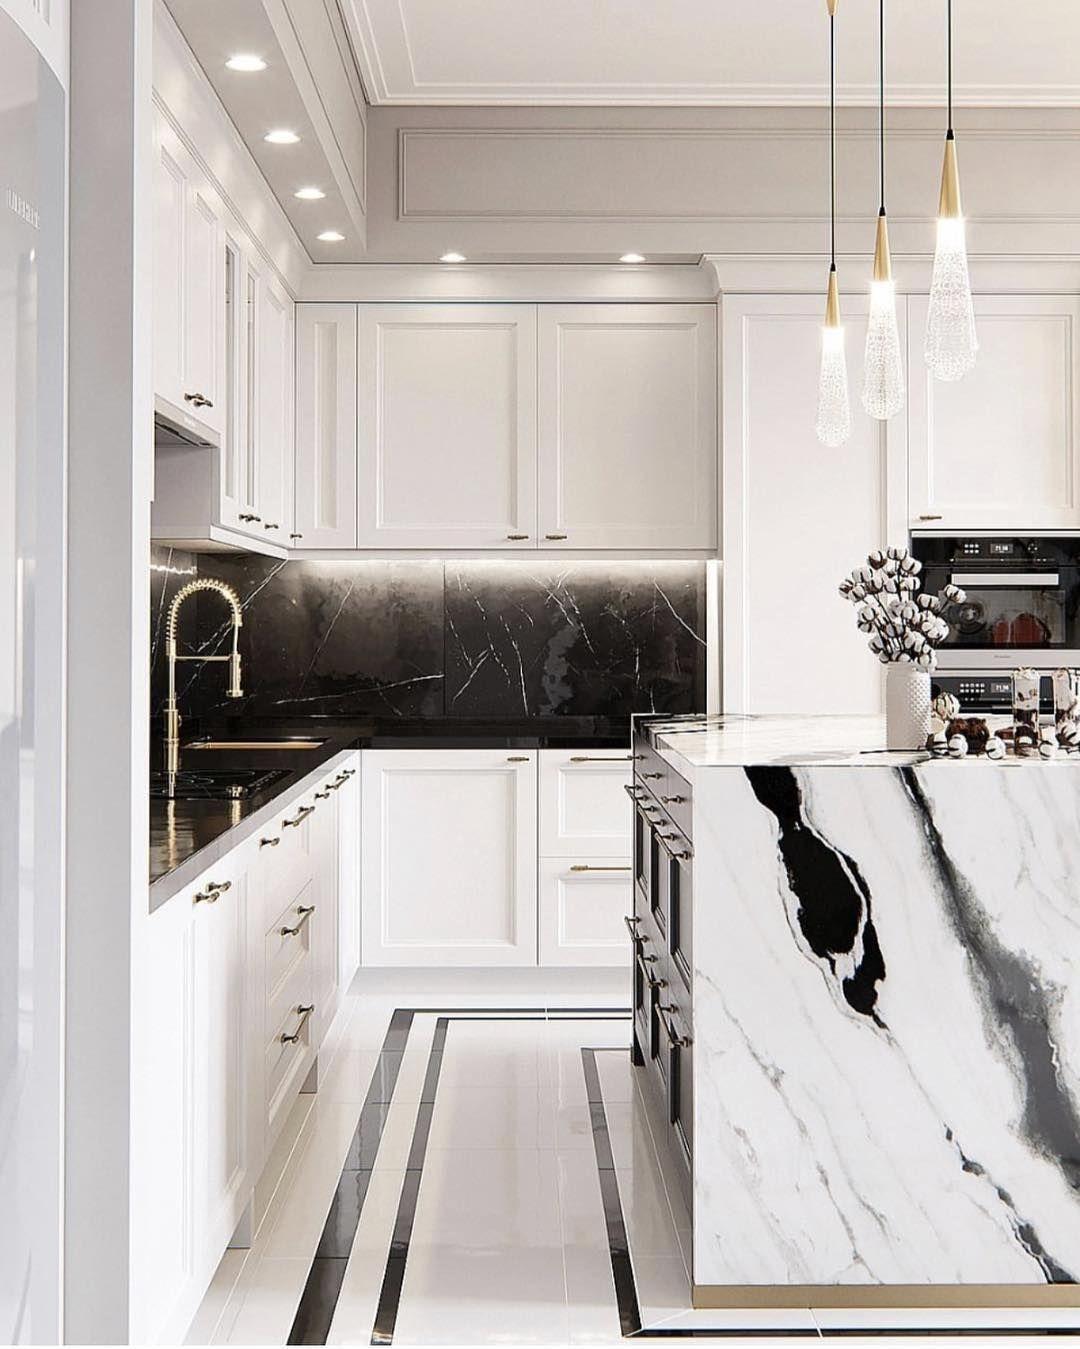 Ashley Stark Kenner On Instagram A Little Panda Marble In The Kitchen Black White And Bold By Bal Interior Design Kitchen Luxury Kitchens Kitchen Interior